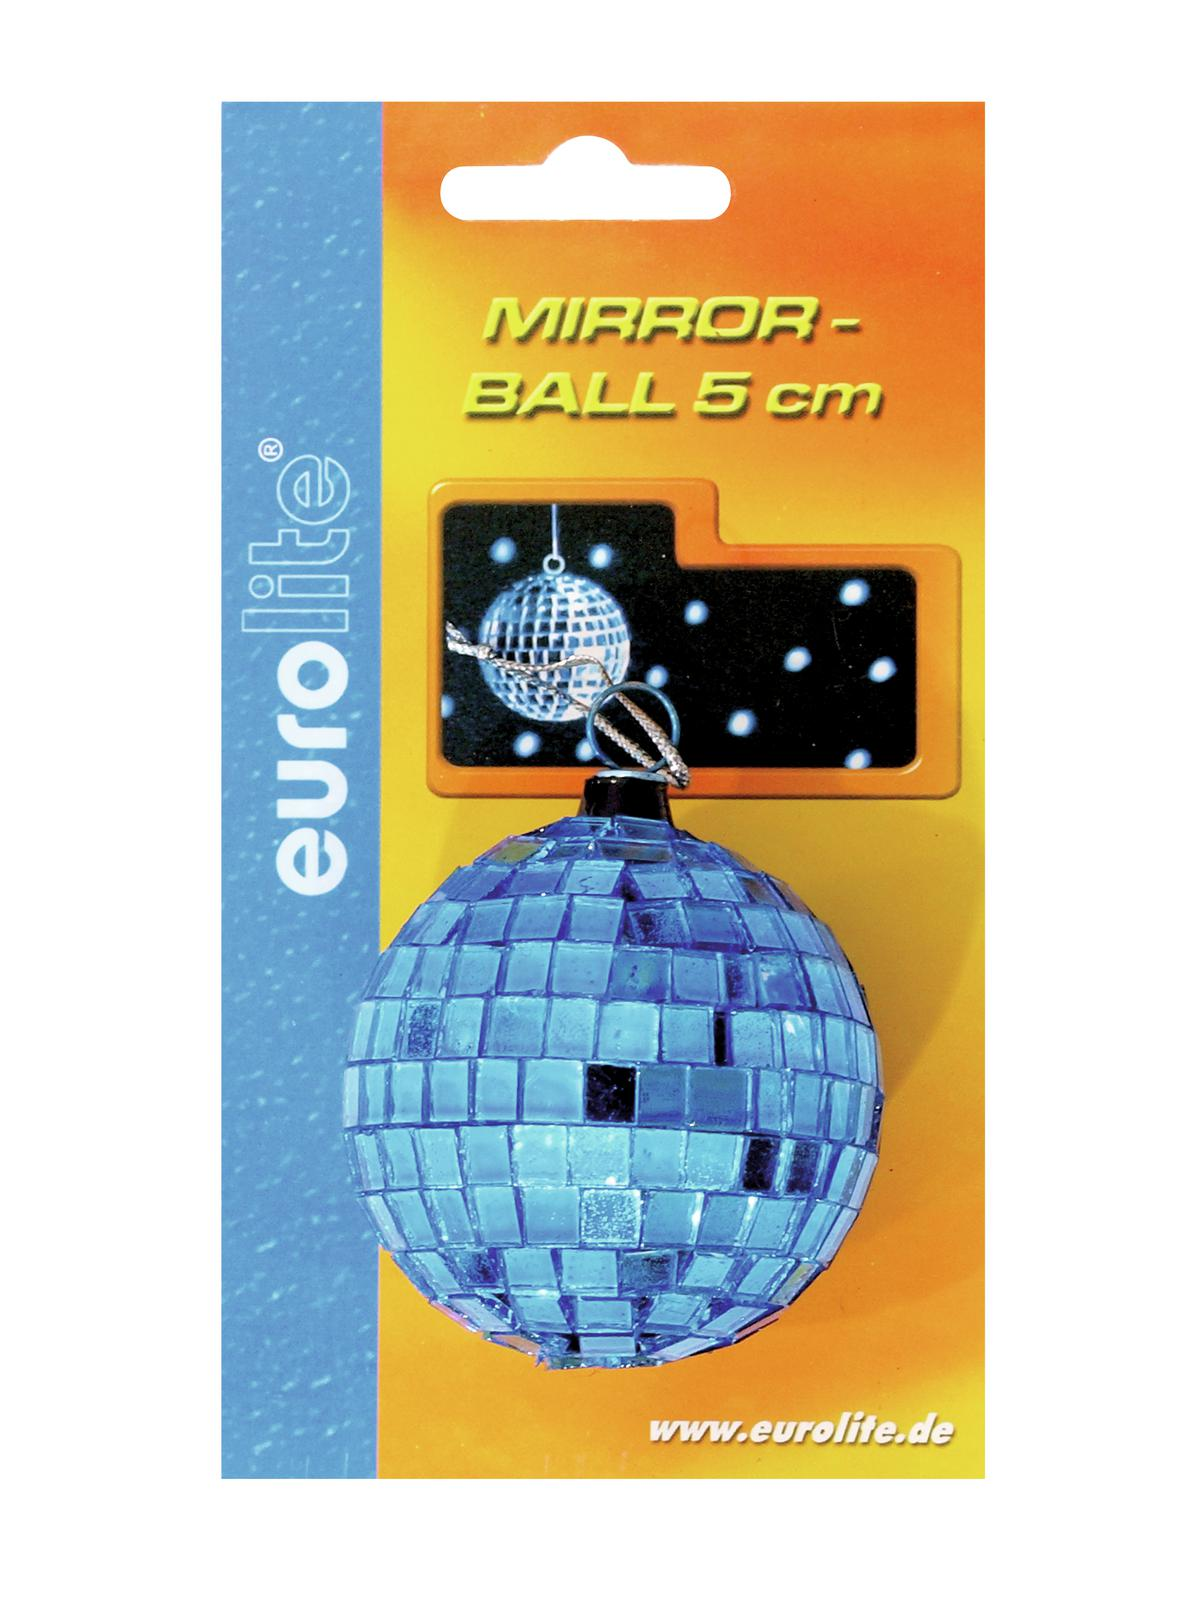 EUROLITE Mirror ball 5cm blu